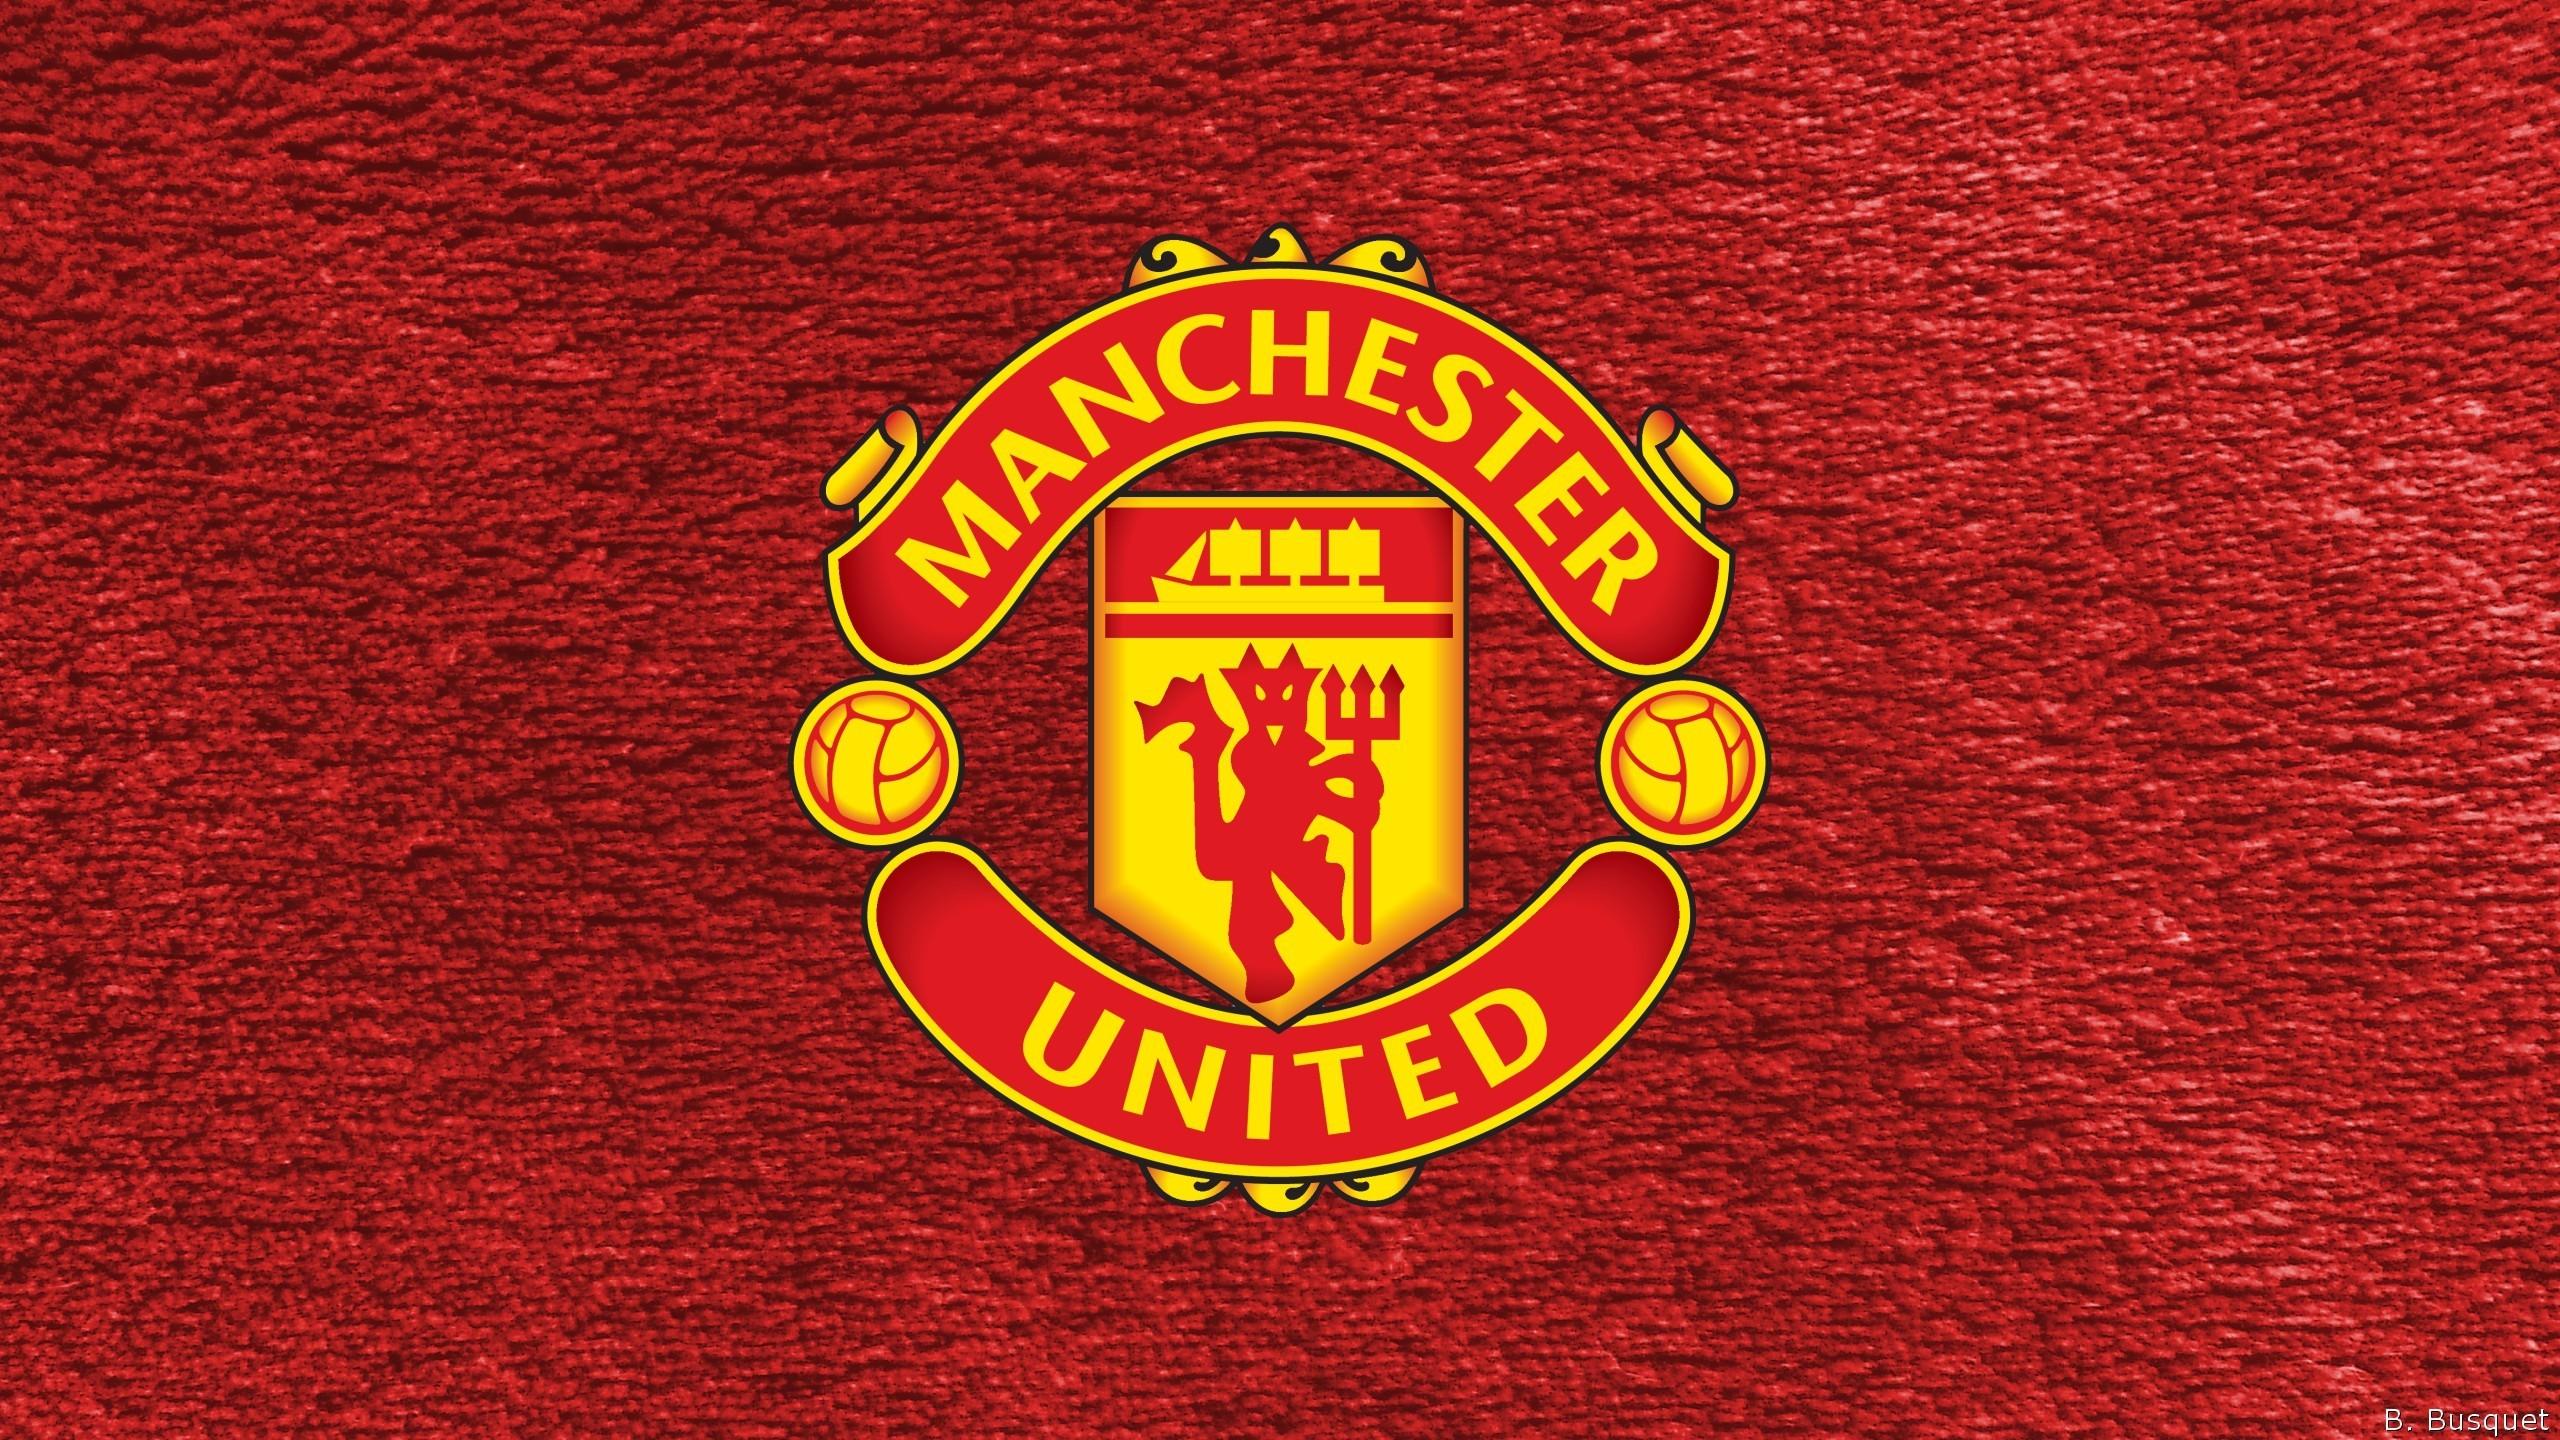 Manchester United Wallpaper Iphone X Manu Logo Wallpaper 183 ① Wallpapertag